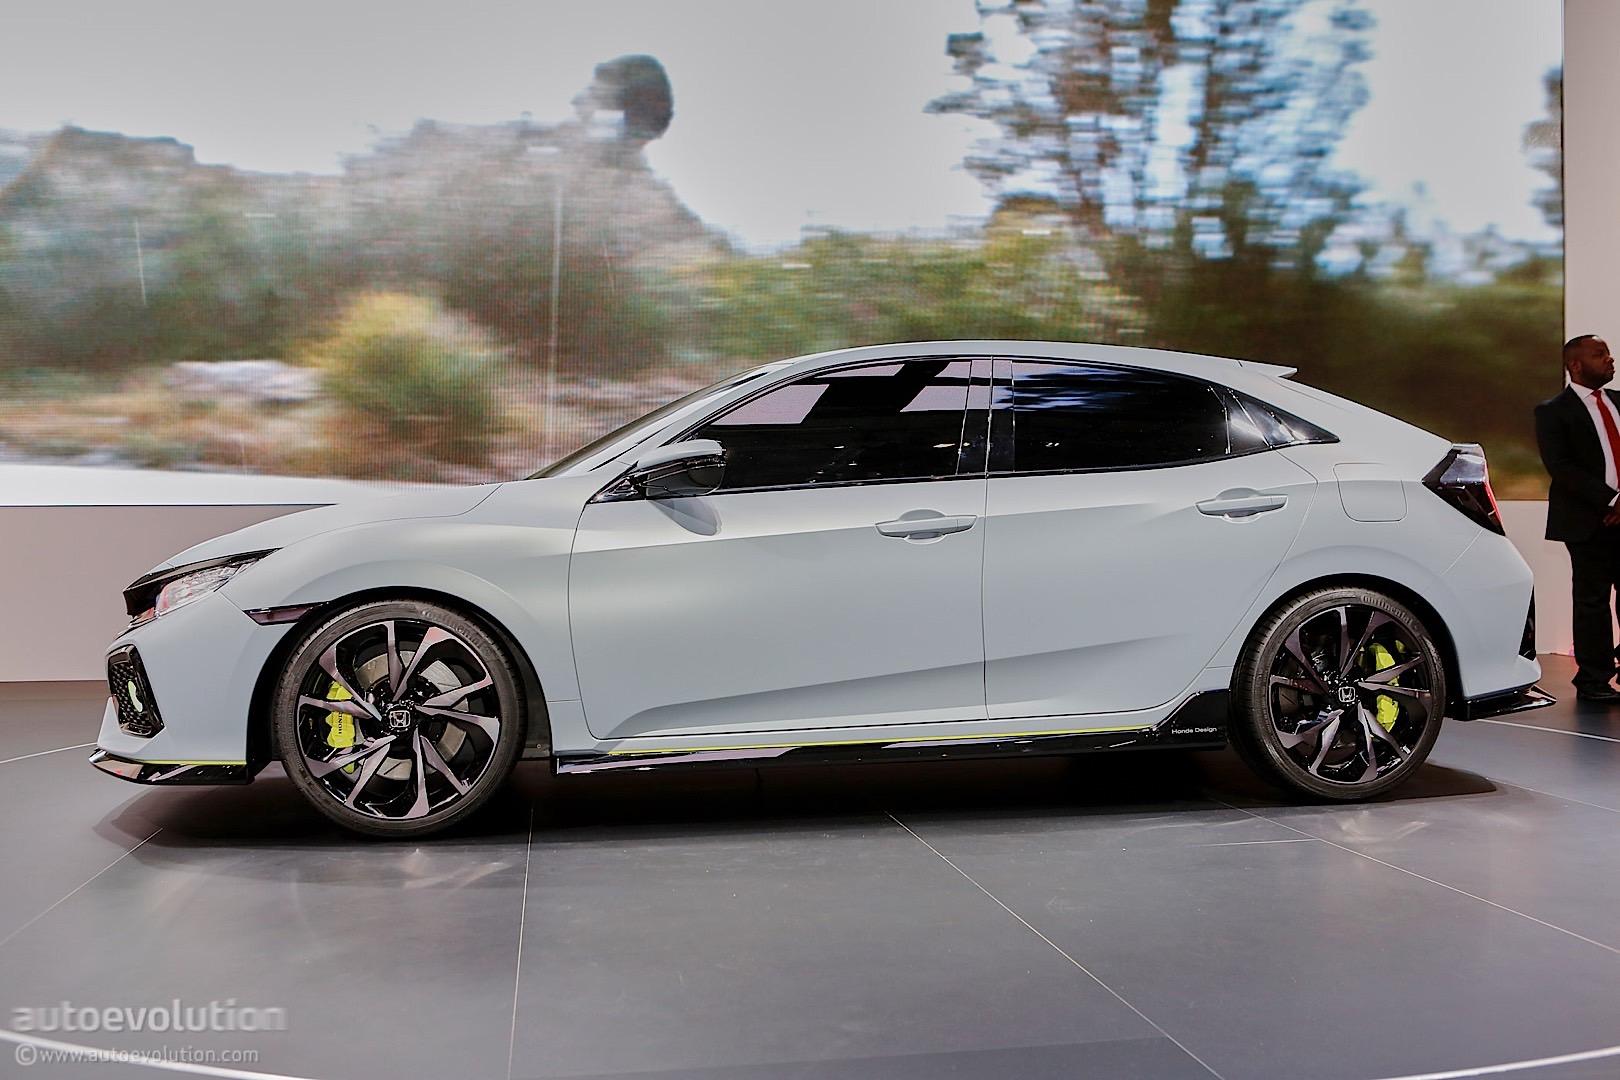 2017 honda civic hatchback previewed by concept in geneva autoevolution. Black Bedroom Furniture Sets. Home Design Ideas